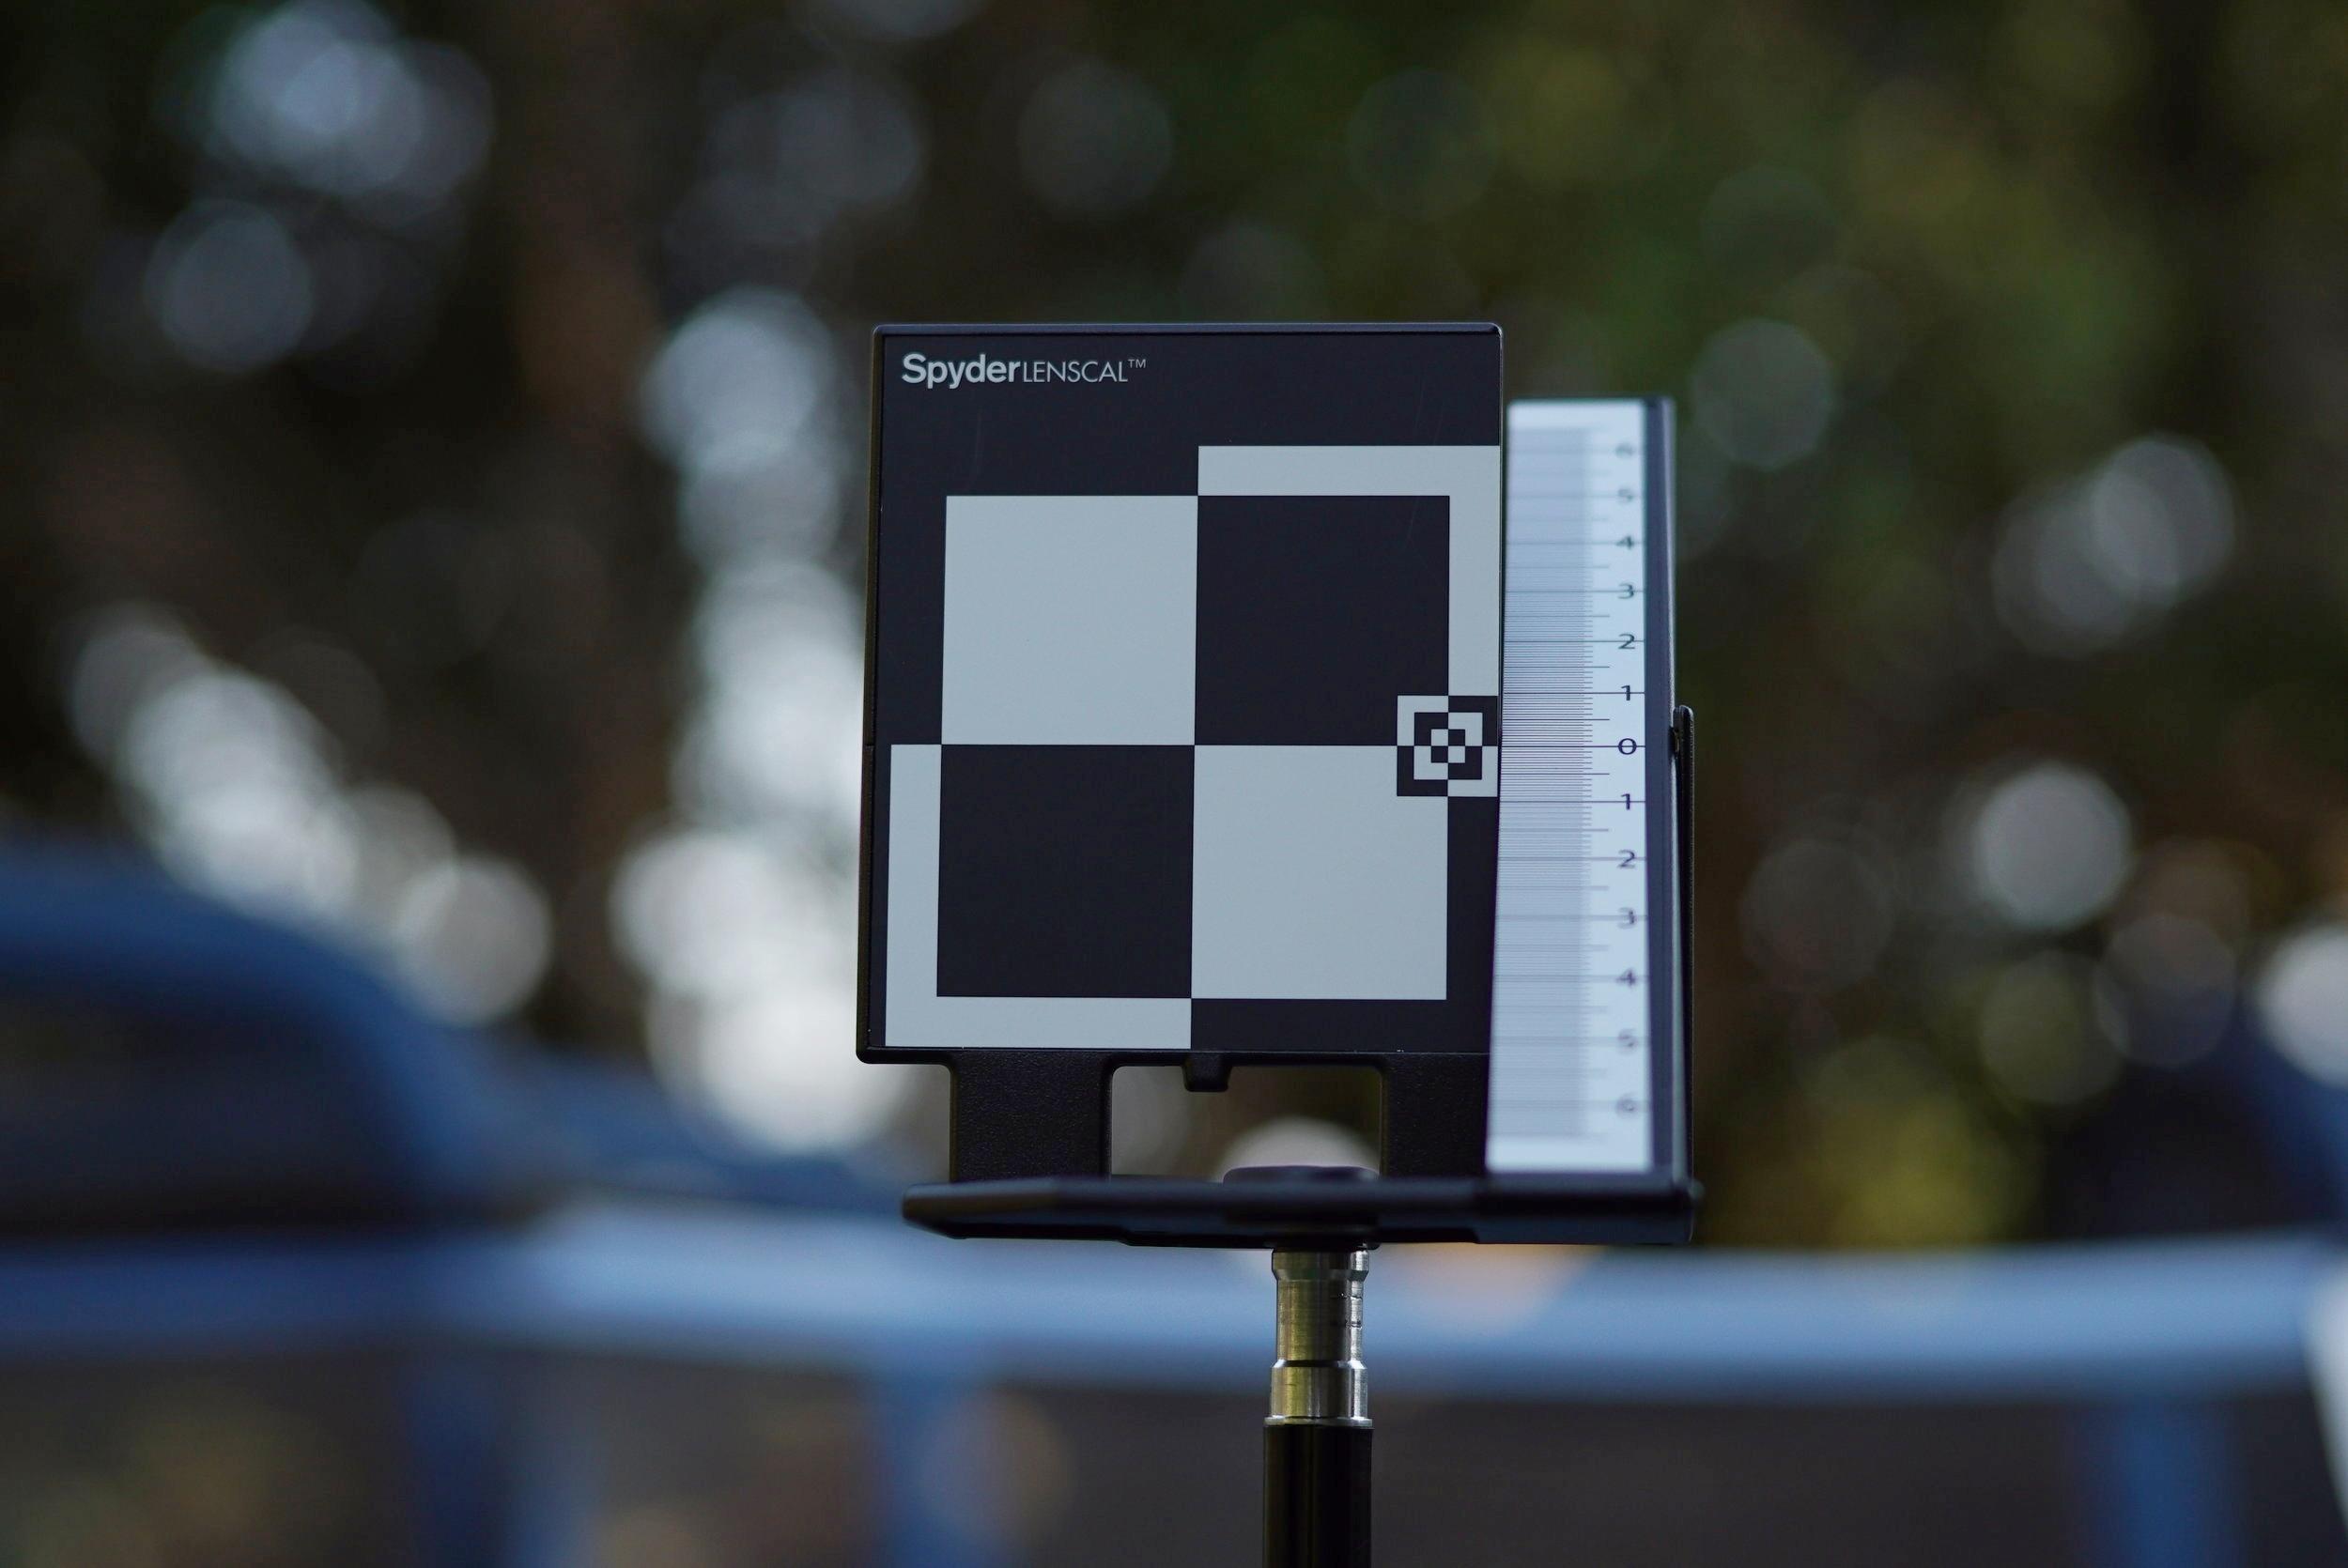 Voigtlander 75 closer to target to emulate 90mm framing. Set at f2.8 (stopped-down).